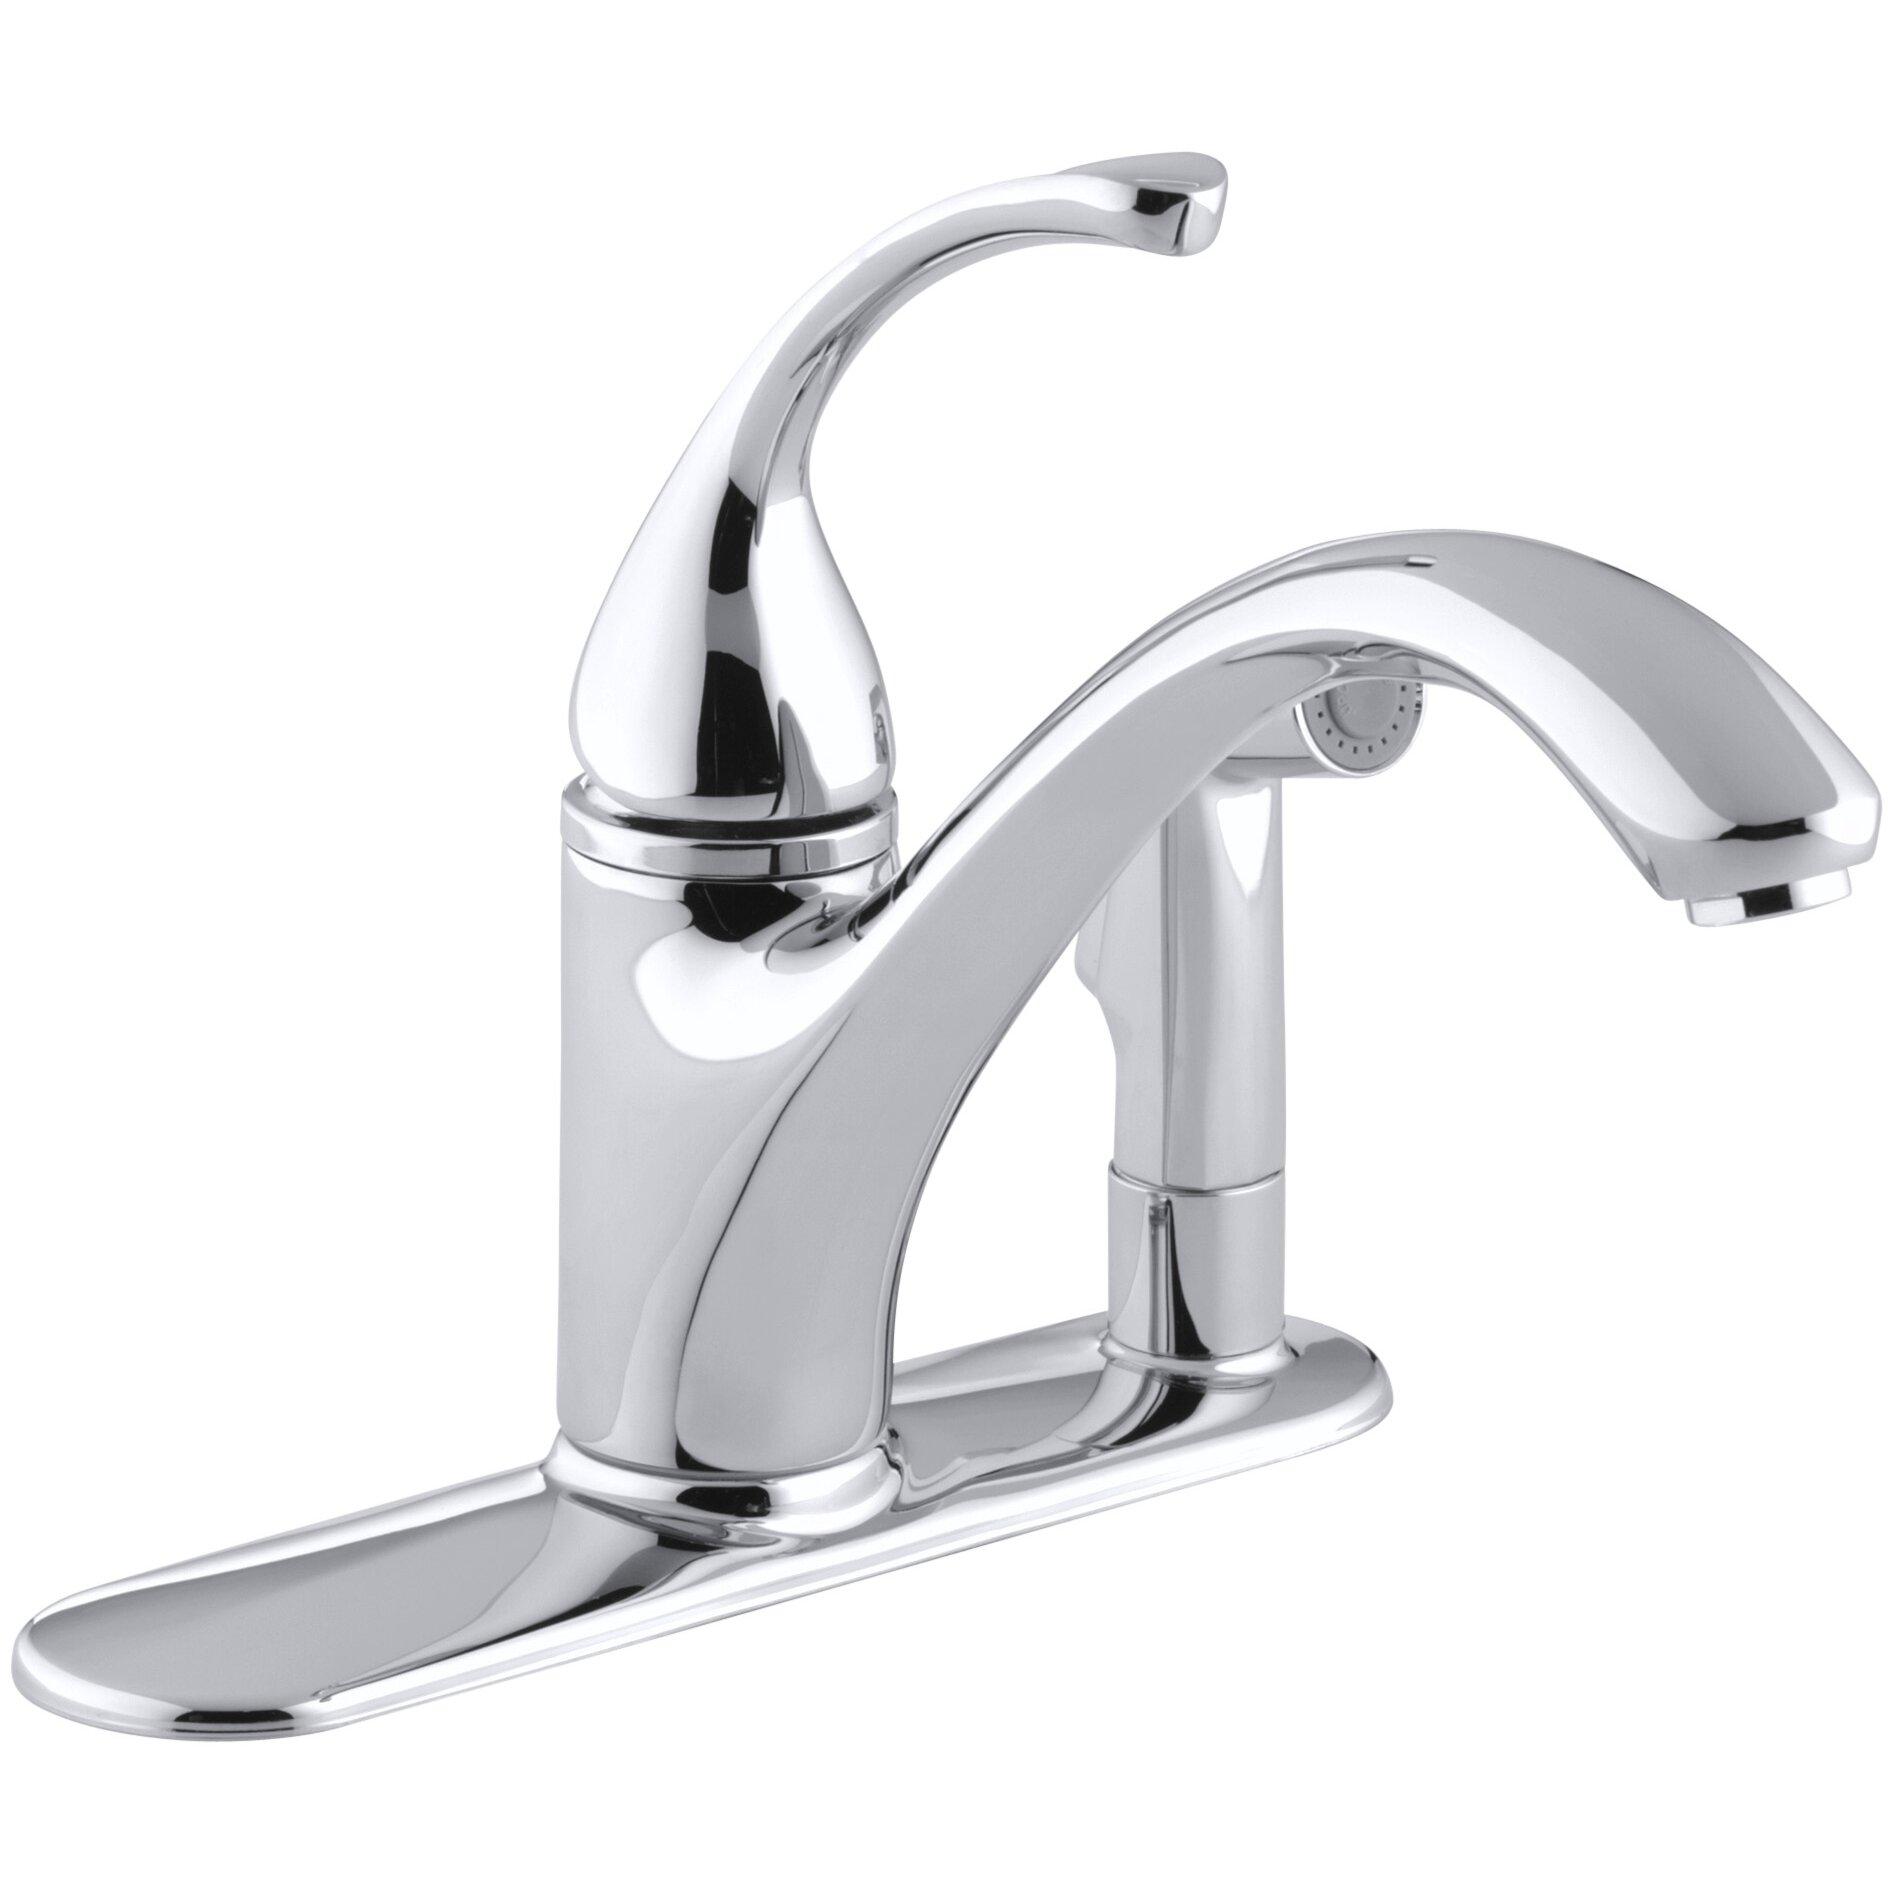 ... kitchen faucet reviews and kohler fairfax kitchen faucet warranty